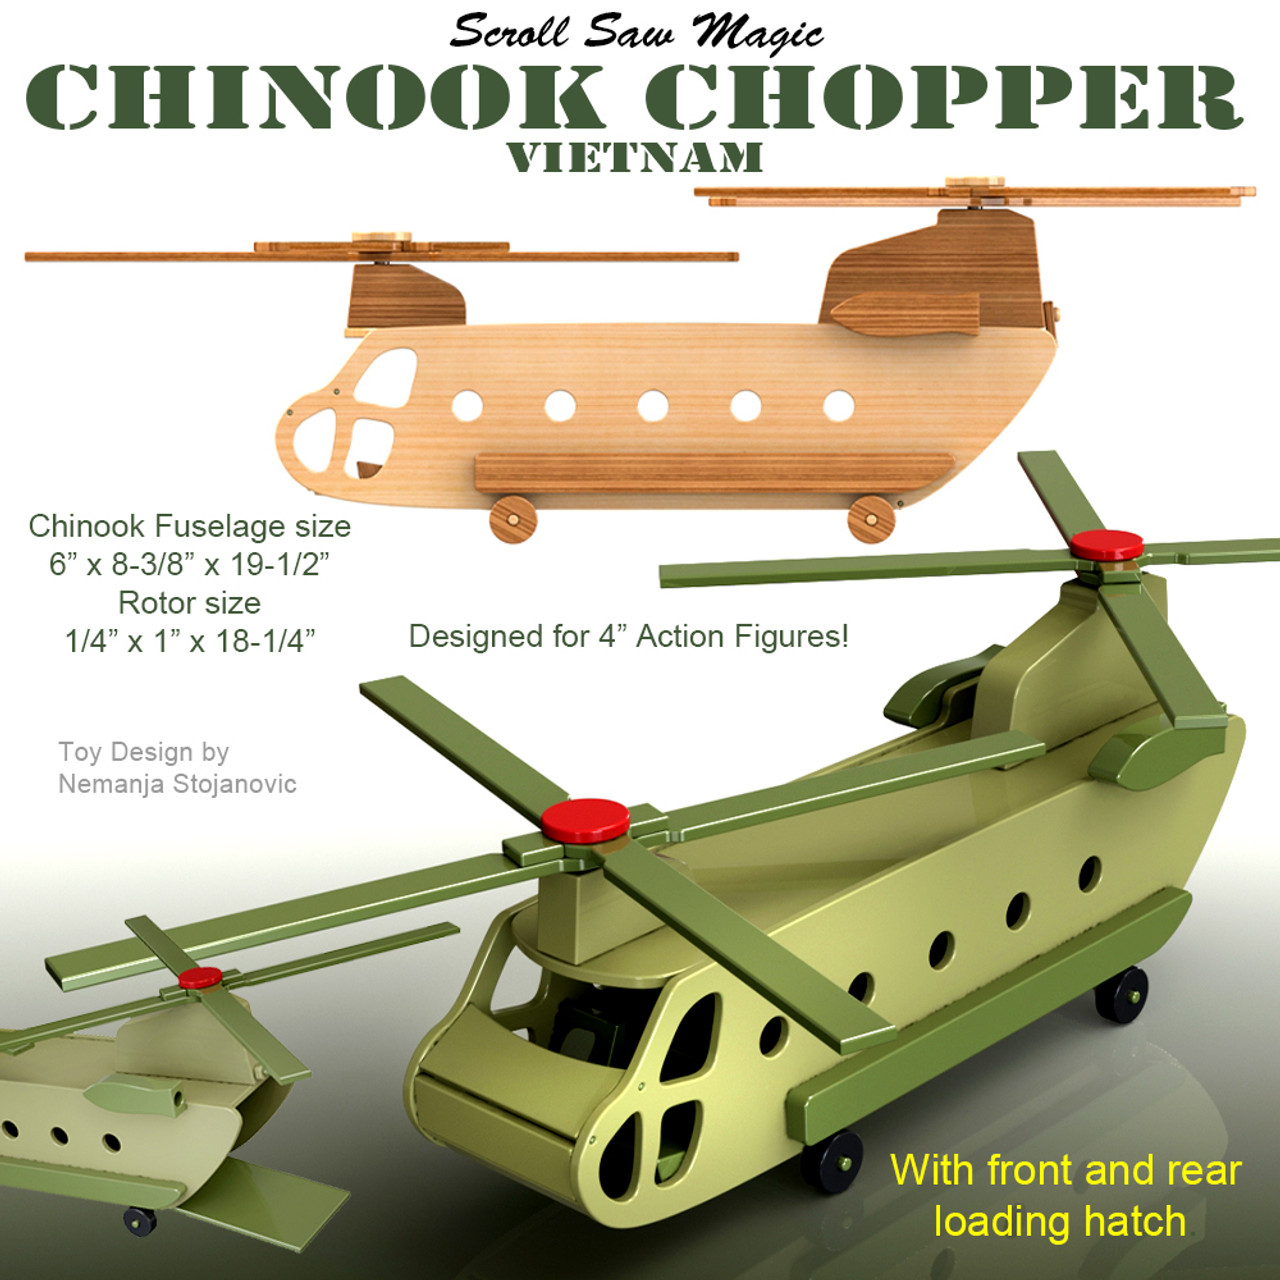 scroll saw magic chinook chopper vietnam wood toy plans (pdf download)